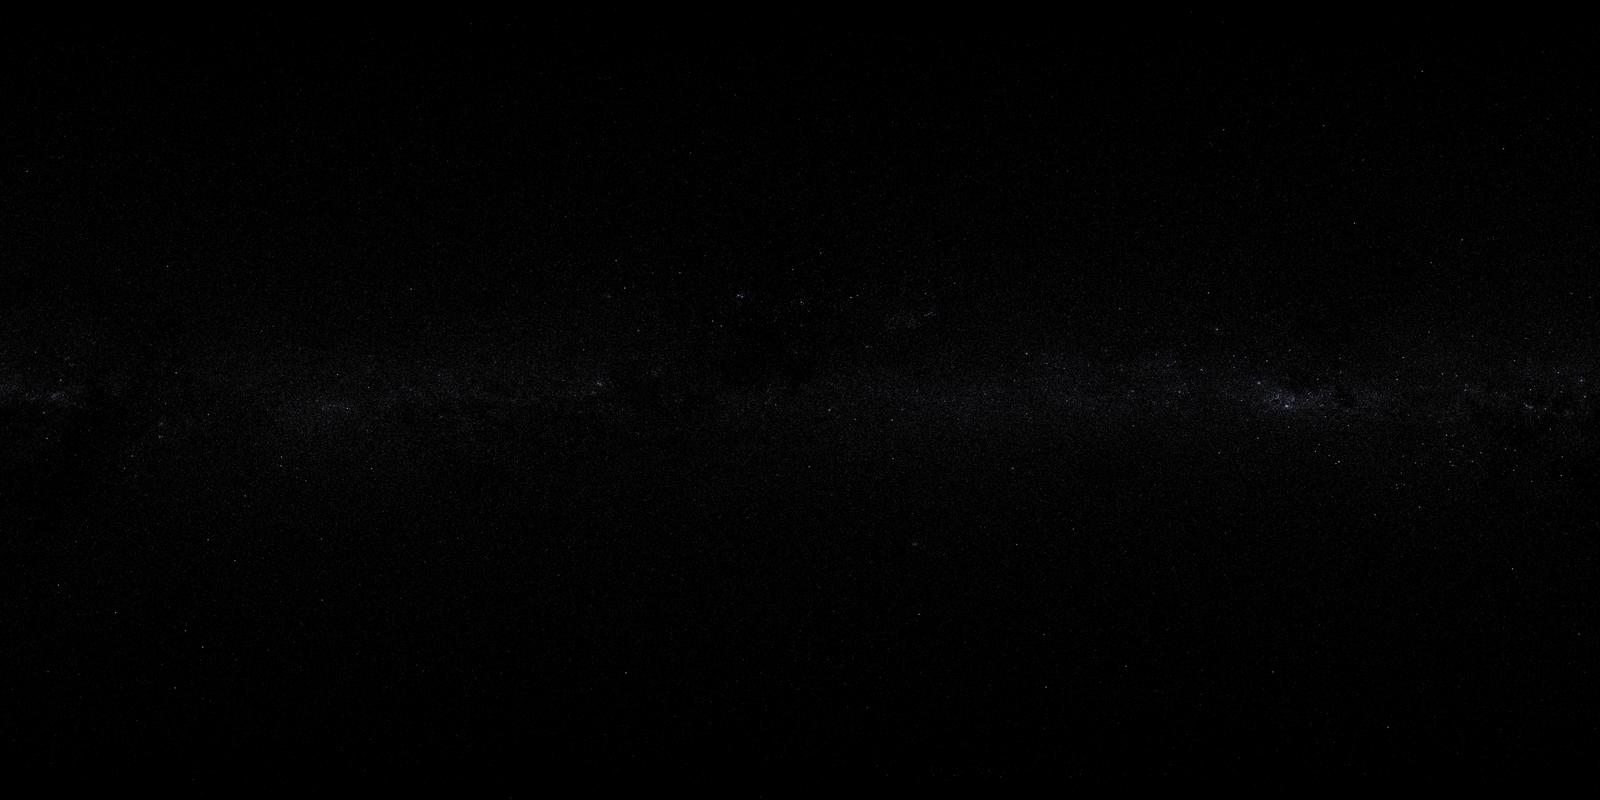 Milky Way Galaxy Global Map 8k by hellstormde